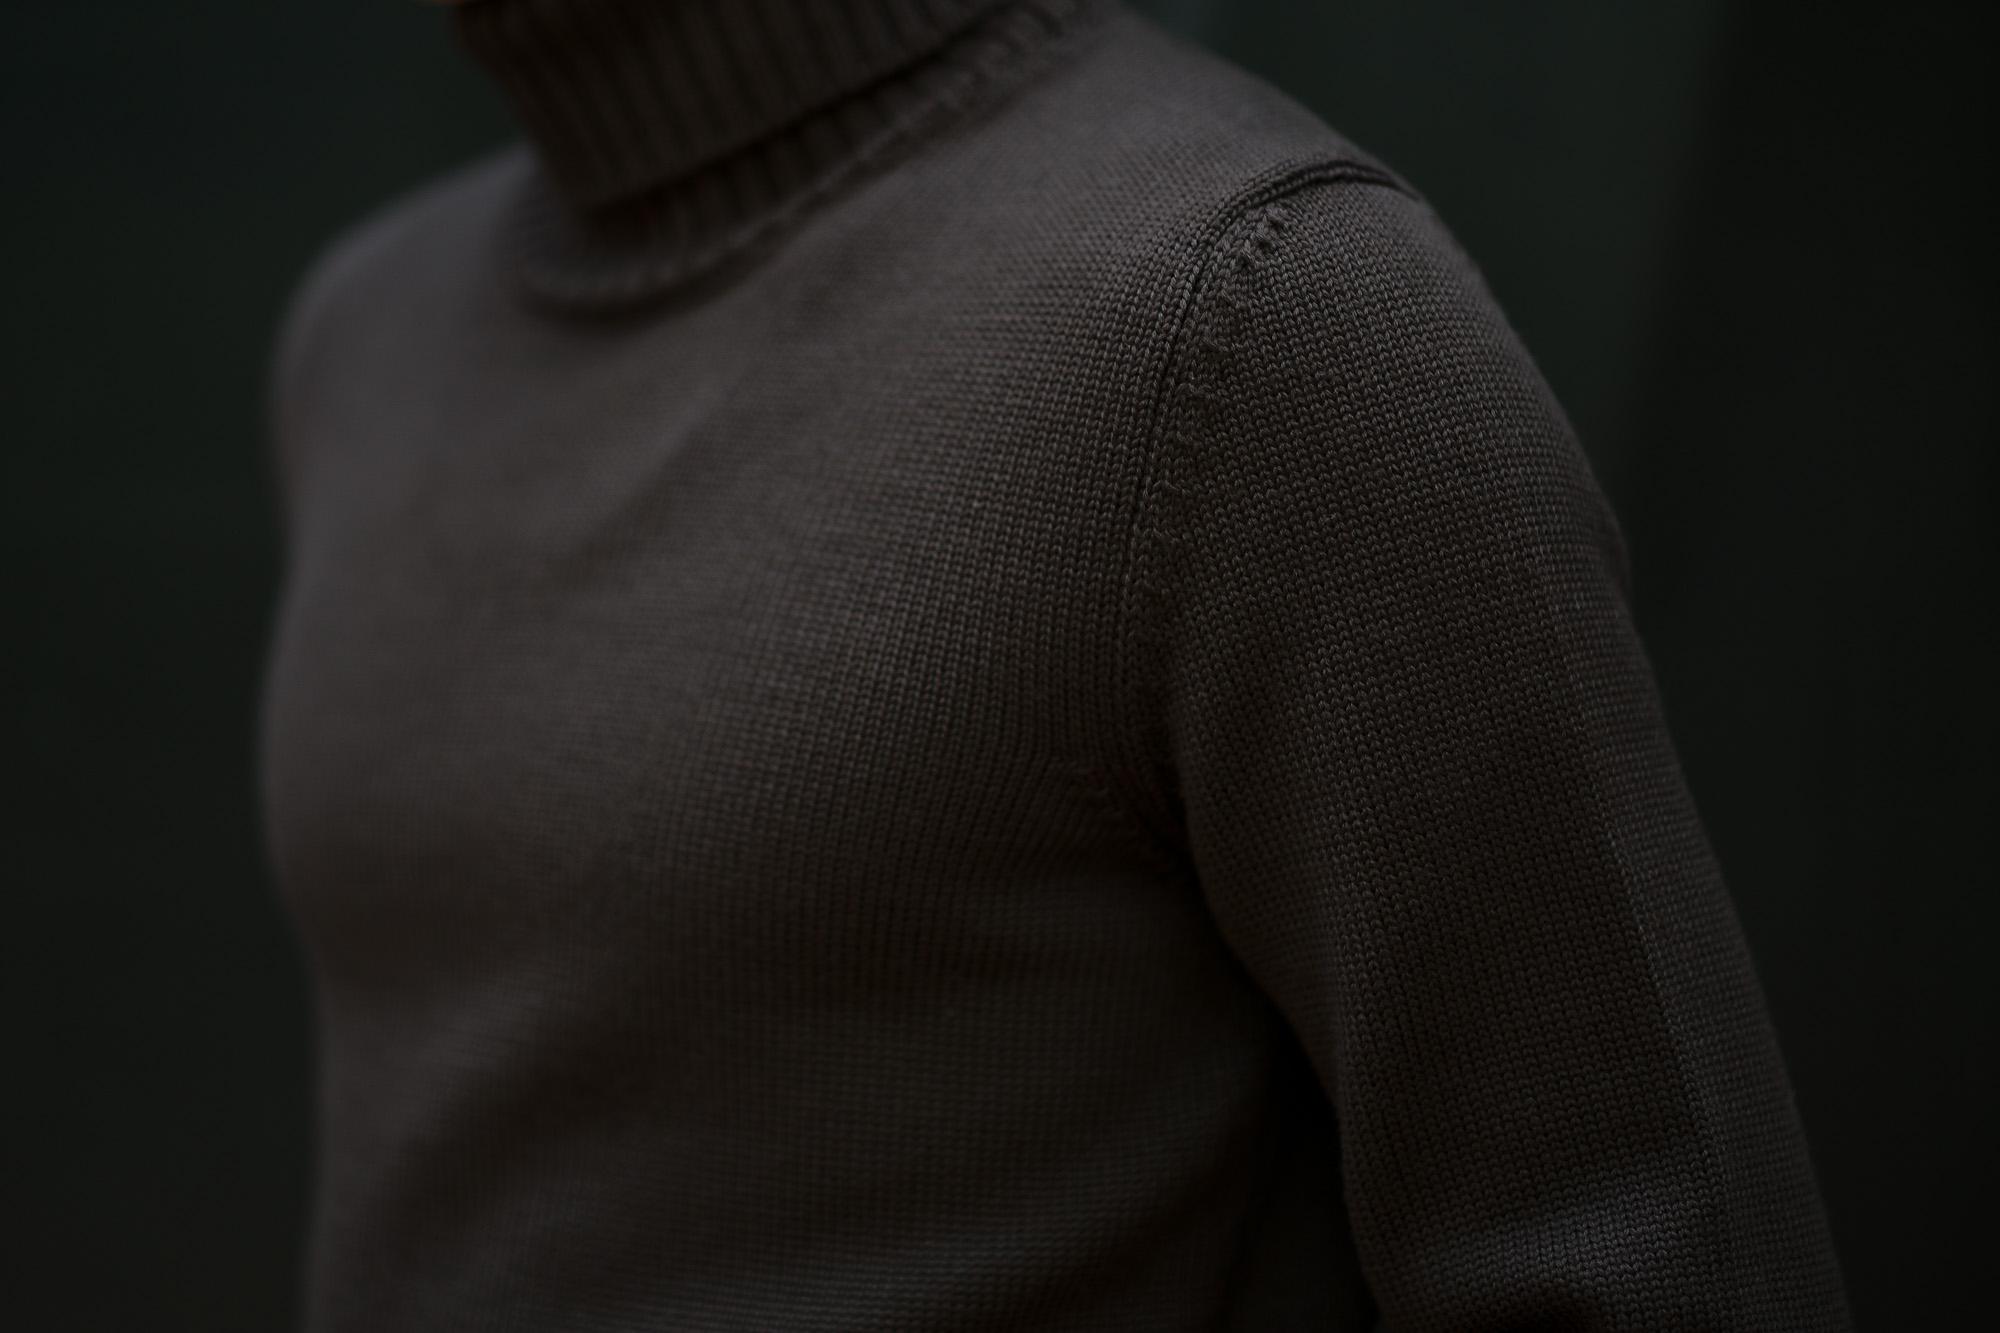 ZANONE (ザノーネ) Turtle Neck Sweater (タートルネックセーター) 810005 Z0229 VIRGIN WOOL 100% ミドルゲージ ウールニット セーター BROWN (ブラウン・Z5204) made in italy (イタリア製) 2019 秋冬新作 【入荷済みとなります】【発売中】  zanone ニット クルーネック 愛知 名古屋 Alto e Diritto アルト エ デリット